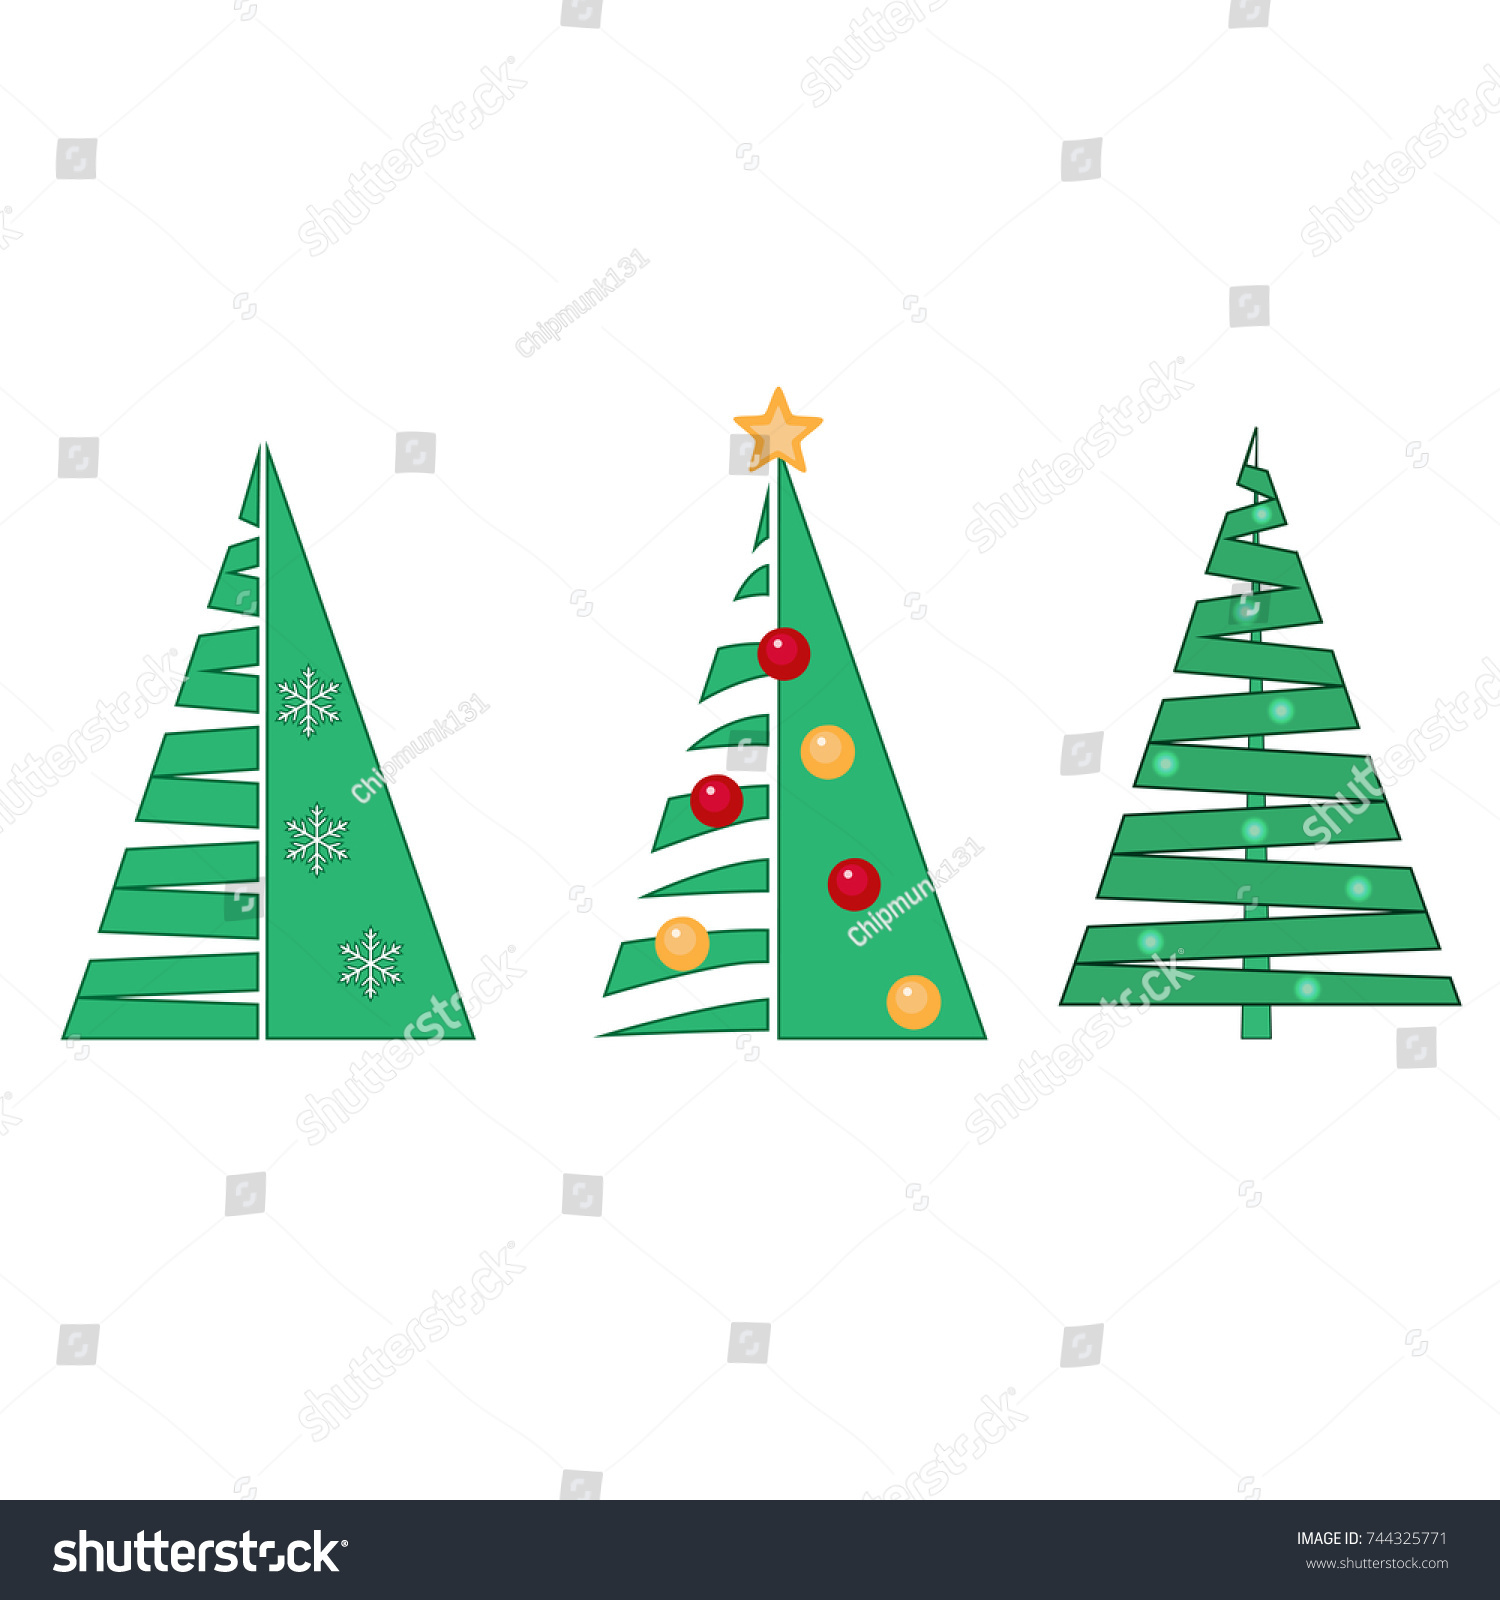 Christmas Collection Vector Silhouettes Fir Trees Stock Vector HD ...